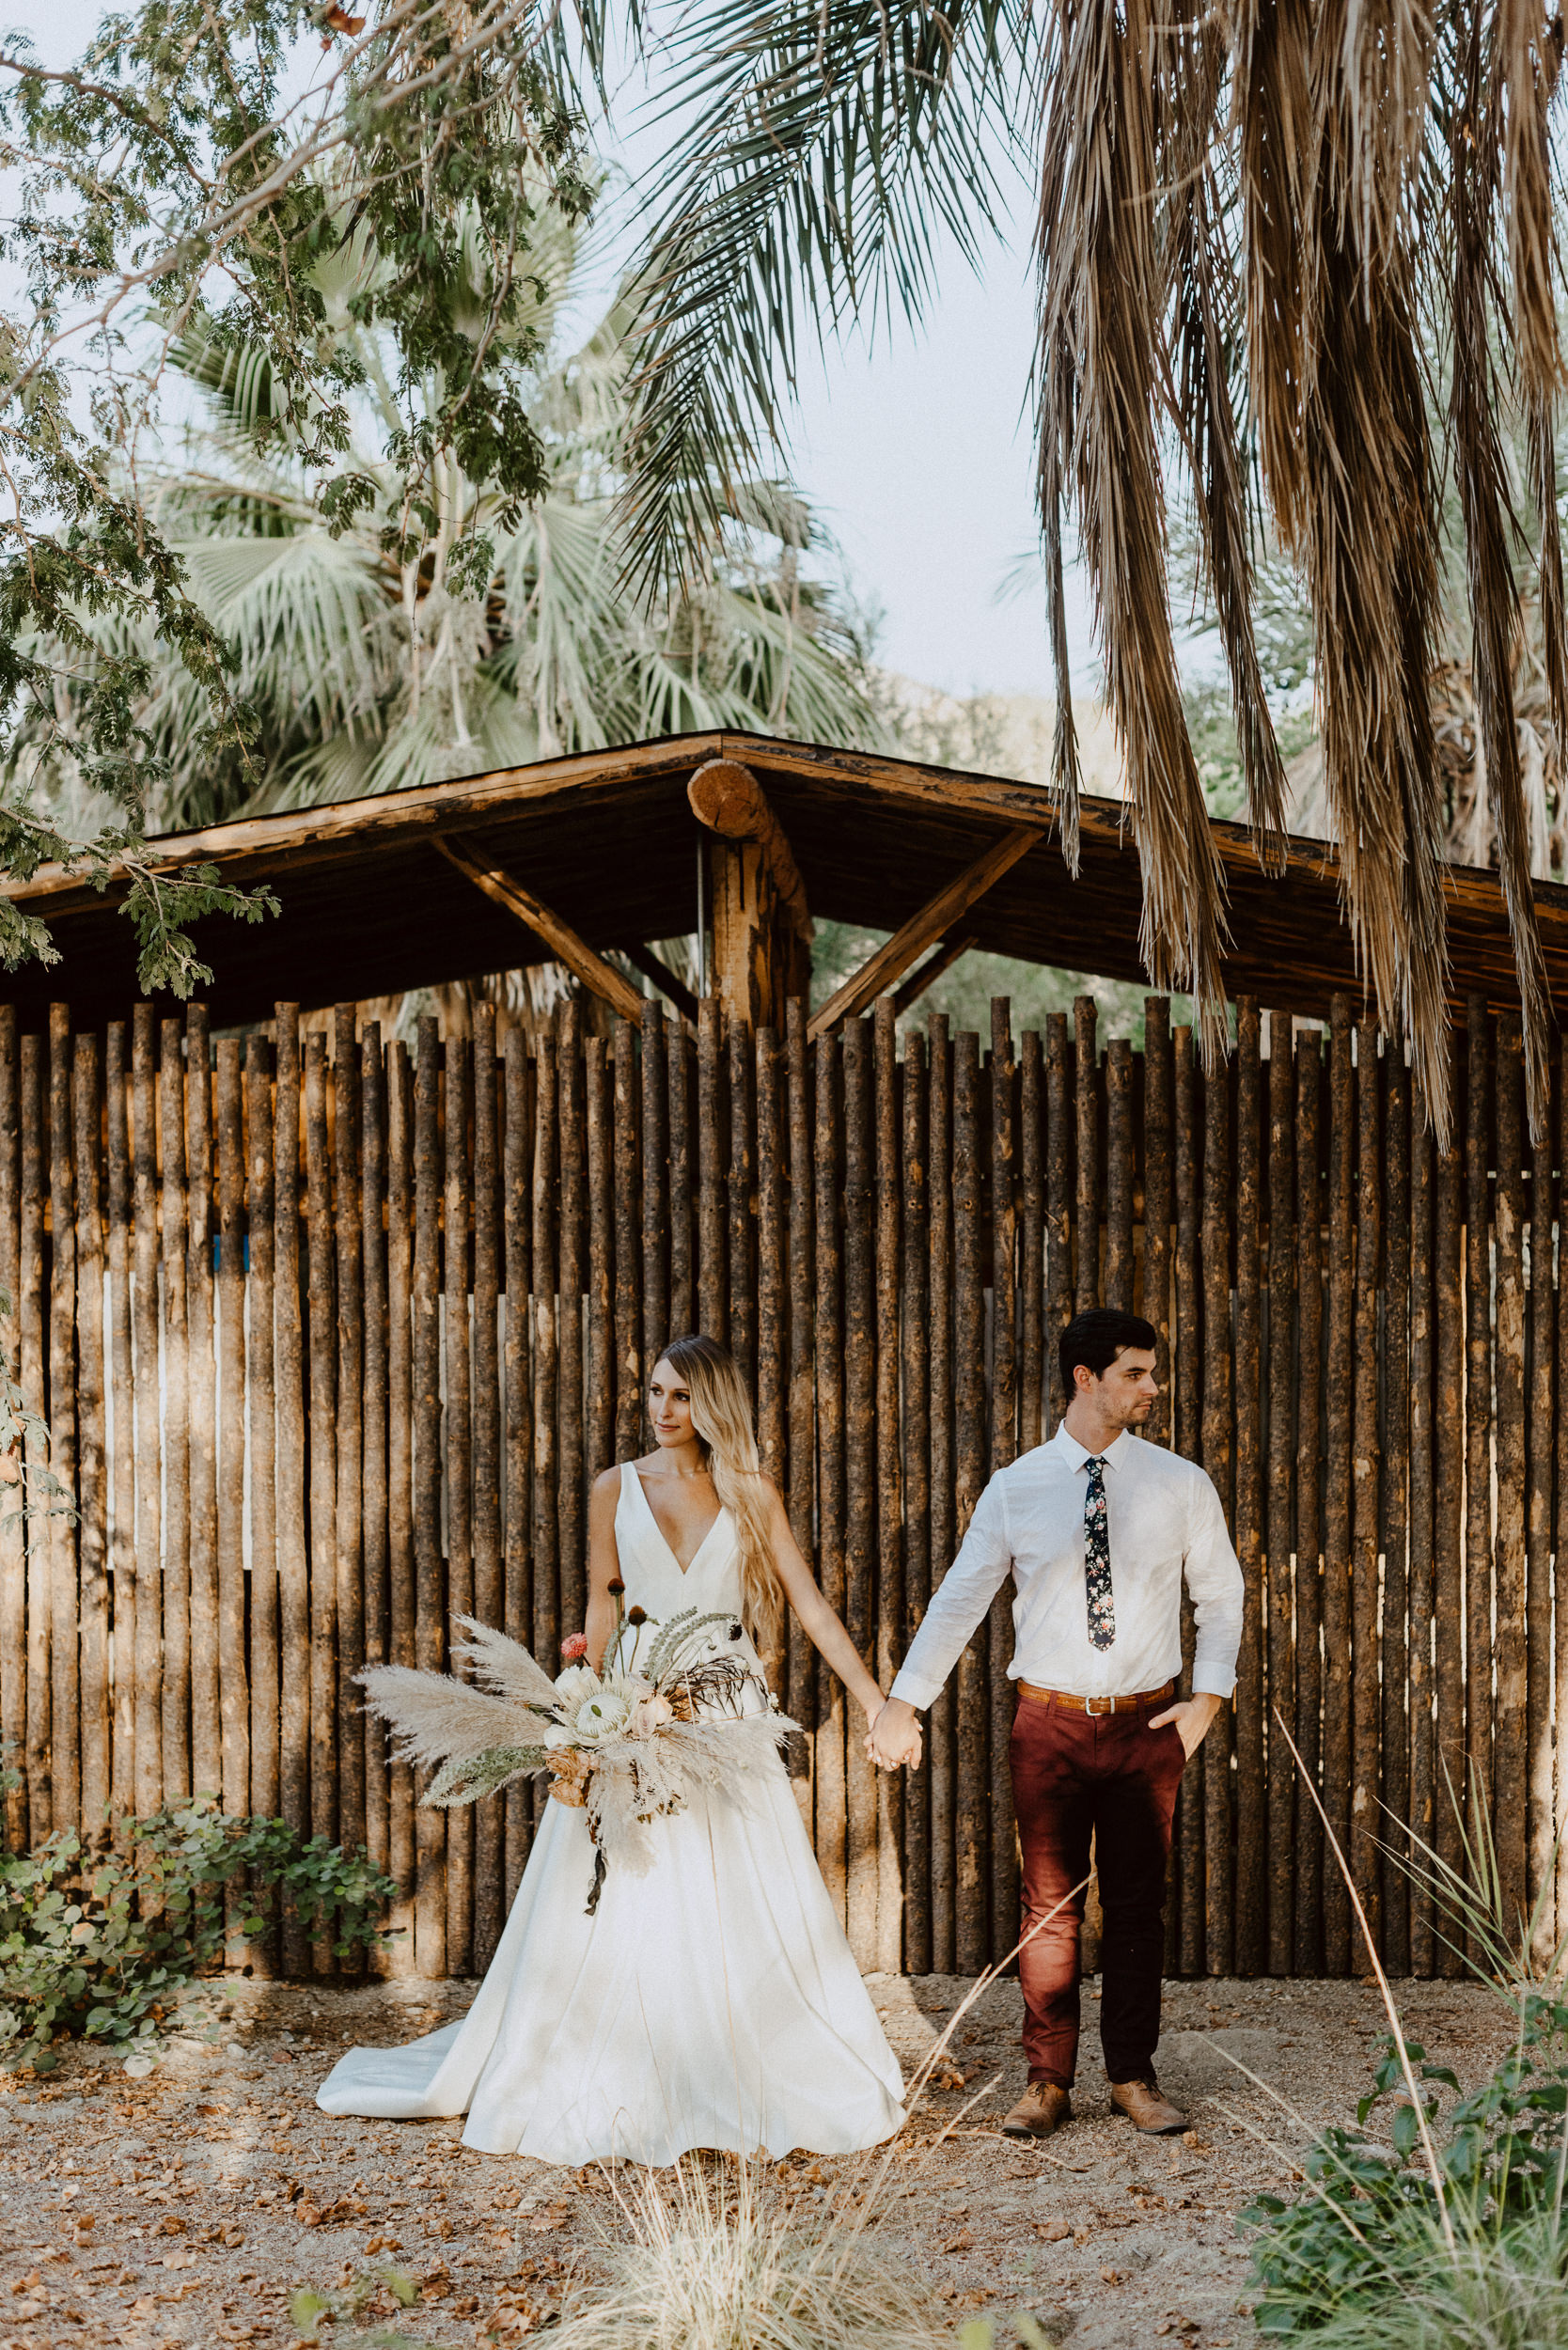 sChelsie + Chris - The Desert Shootout Wedding Romantics at The Living Desert-99.jpg